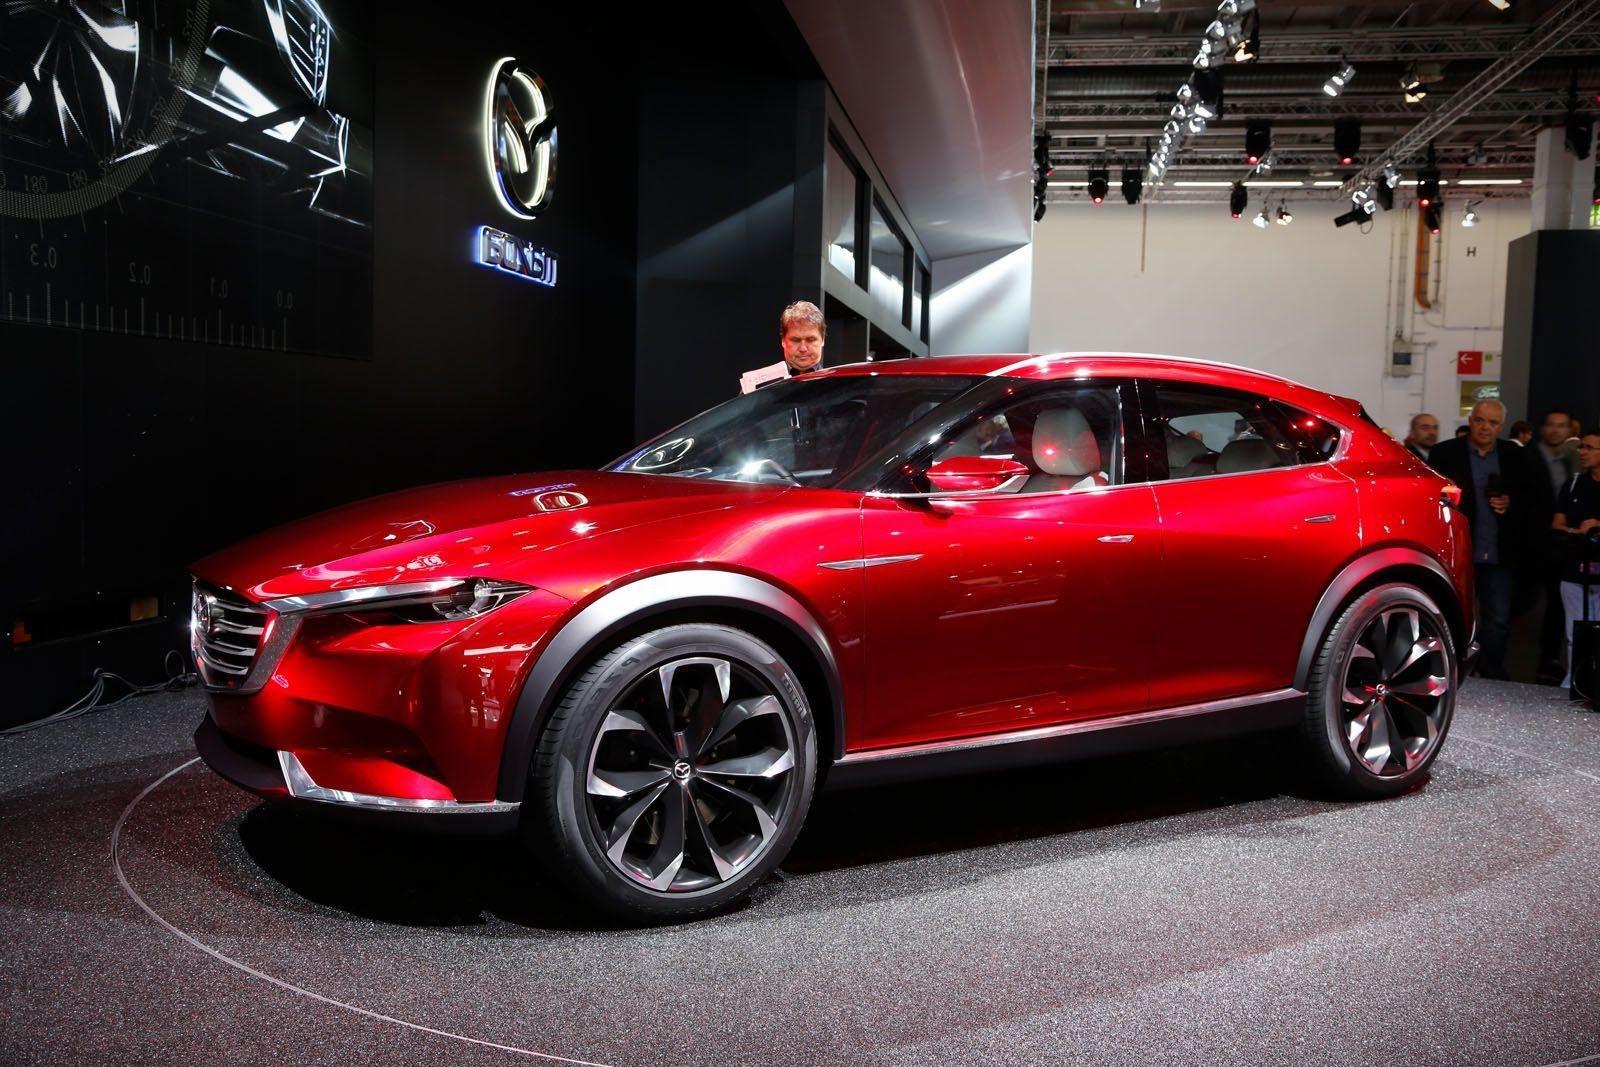 2020 Mazda Cx 3 Release Date And Specs - Mazda Cx 3 2020 ...